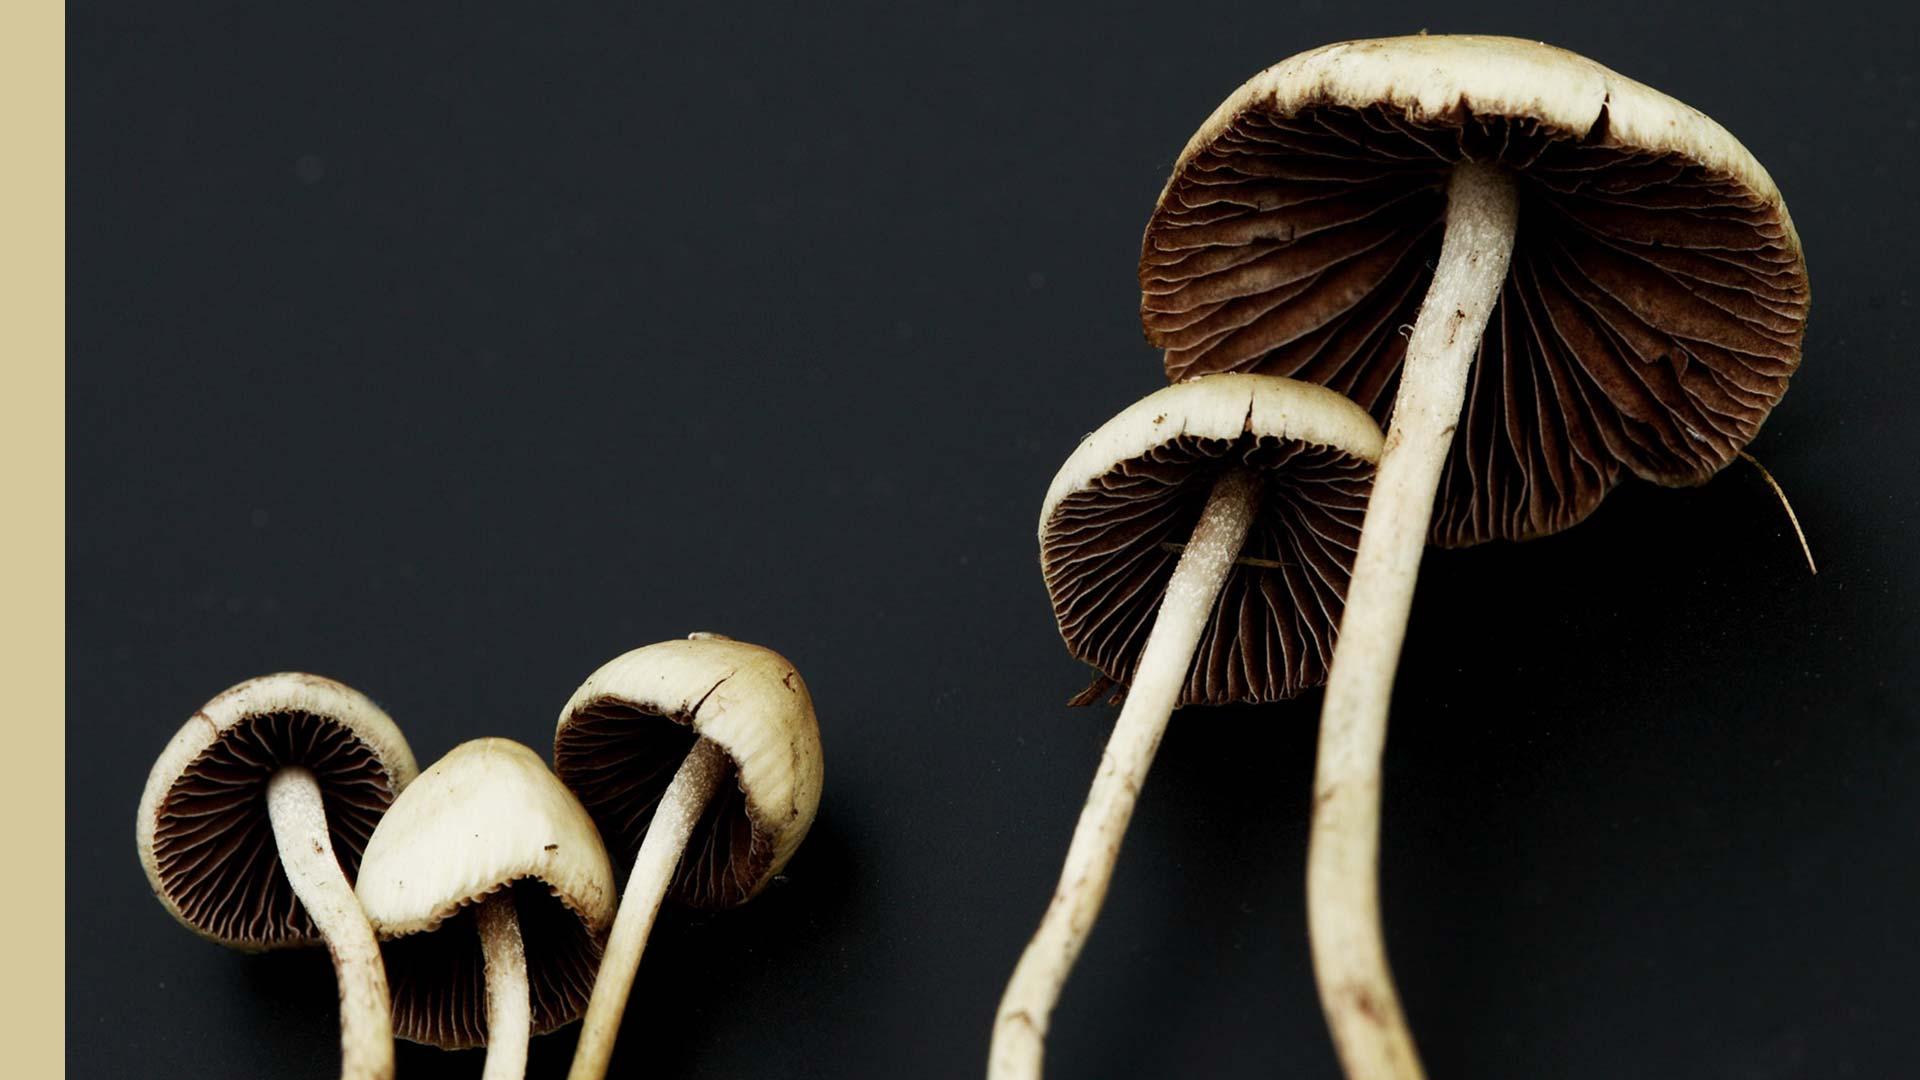 Magic-Mushrooms-top-image